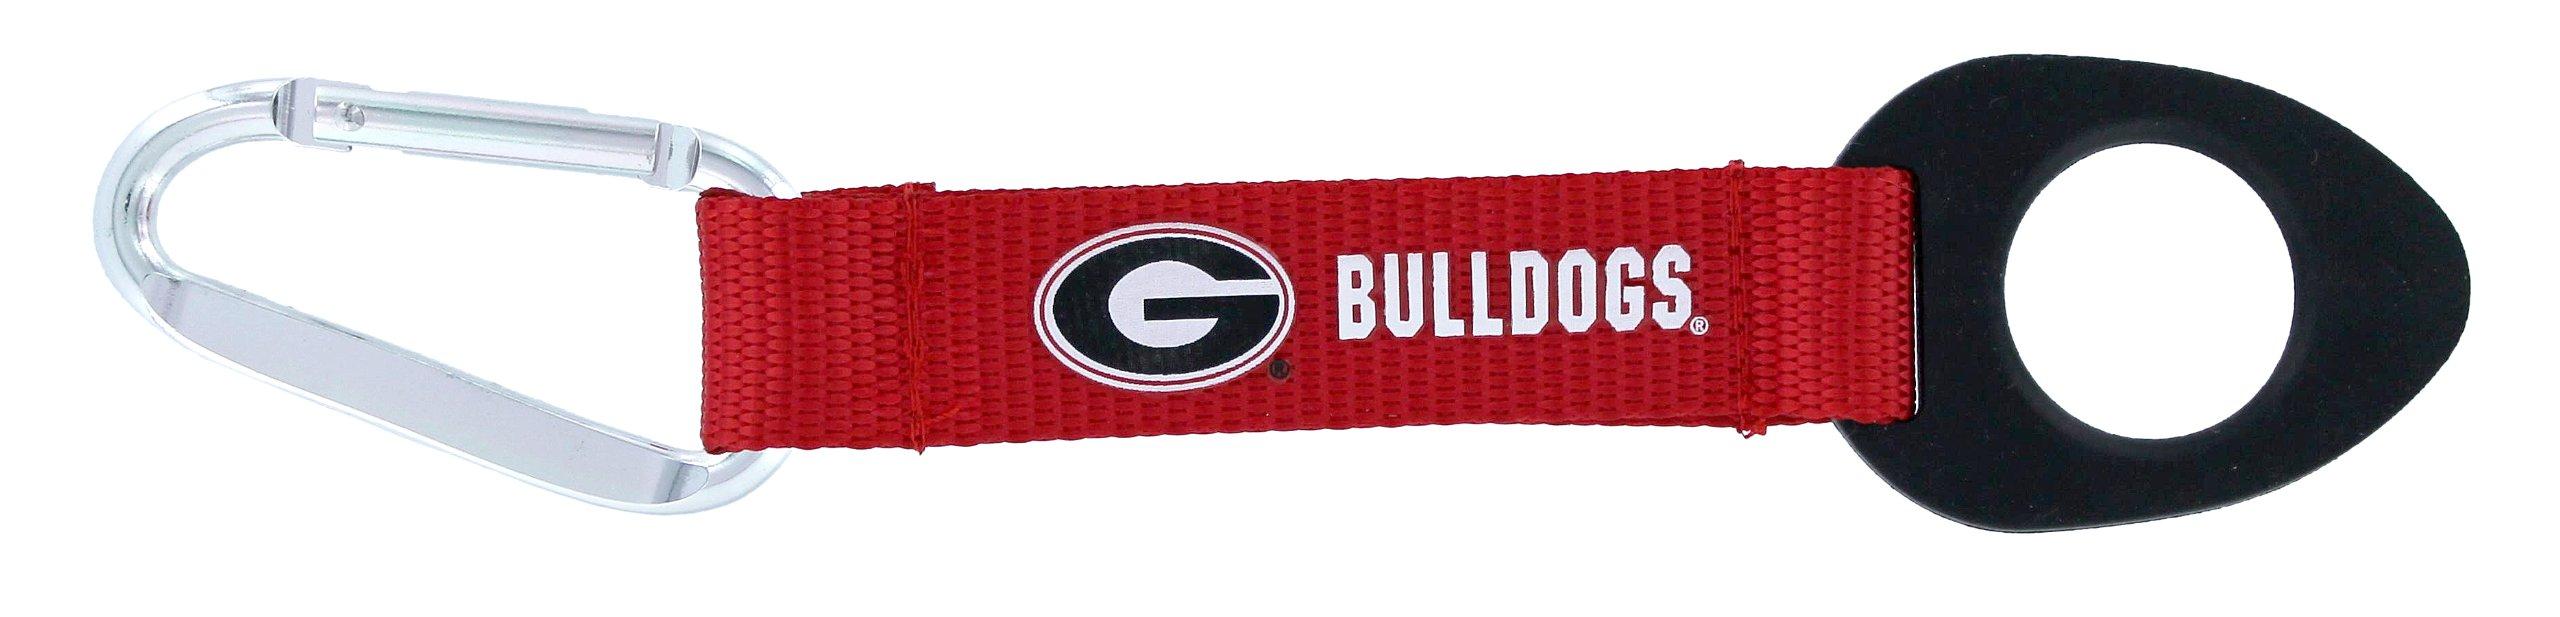 NCAA Georgia Bulldogs Carabiner Bottle Holder Keychain by aminco (Image #1)